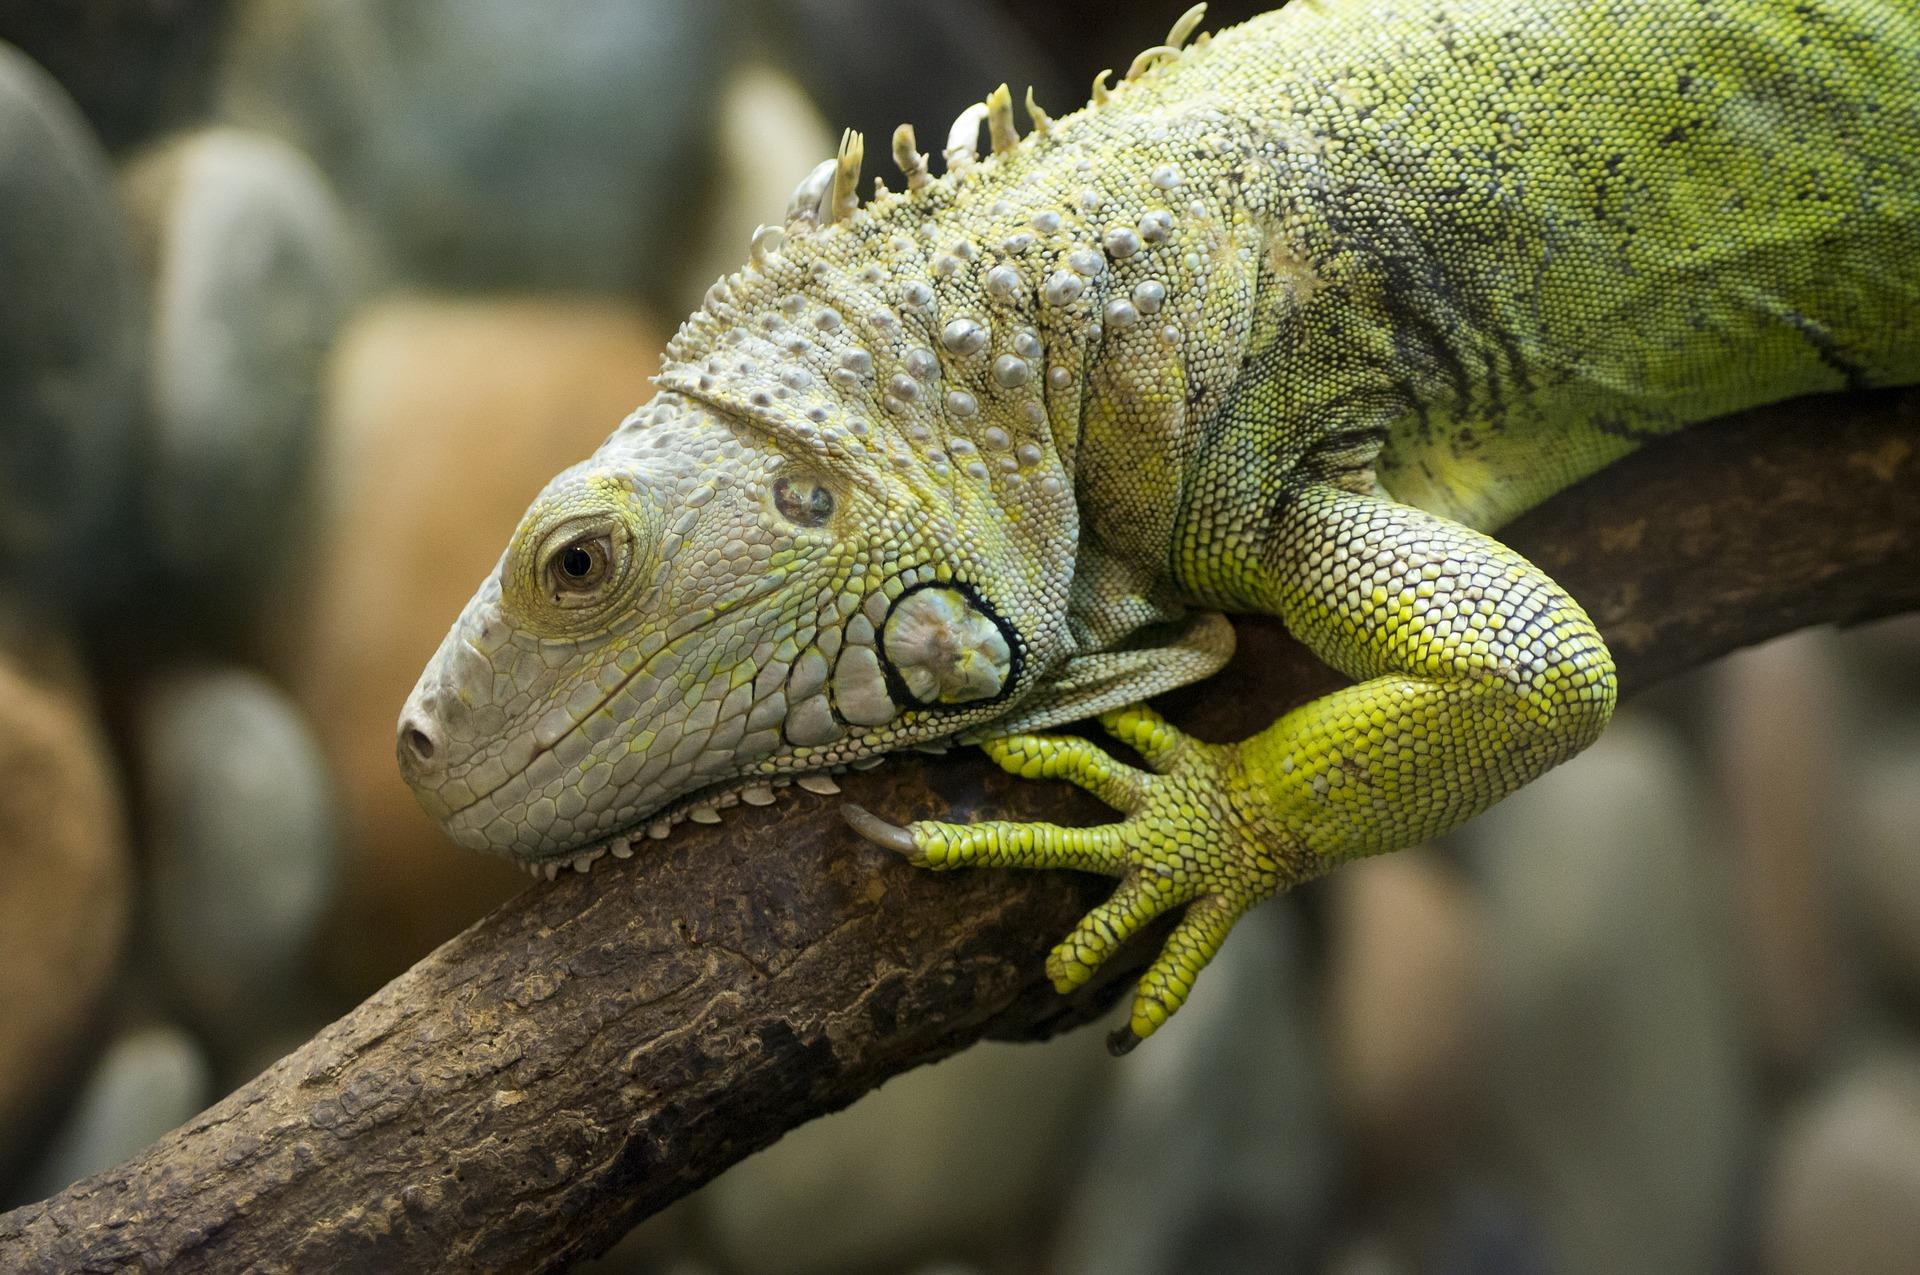 iguana verde moviéndose por una rama